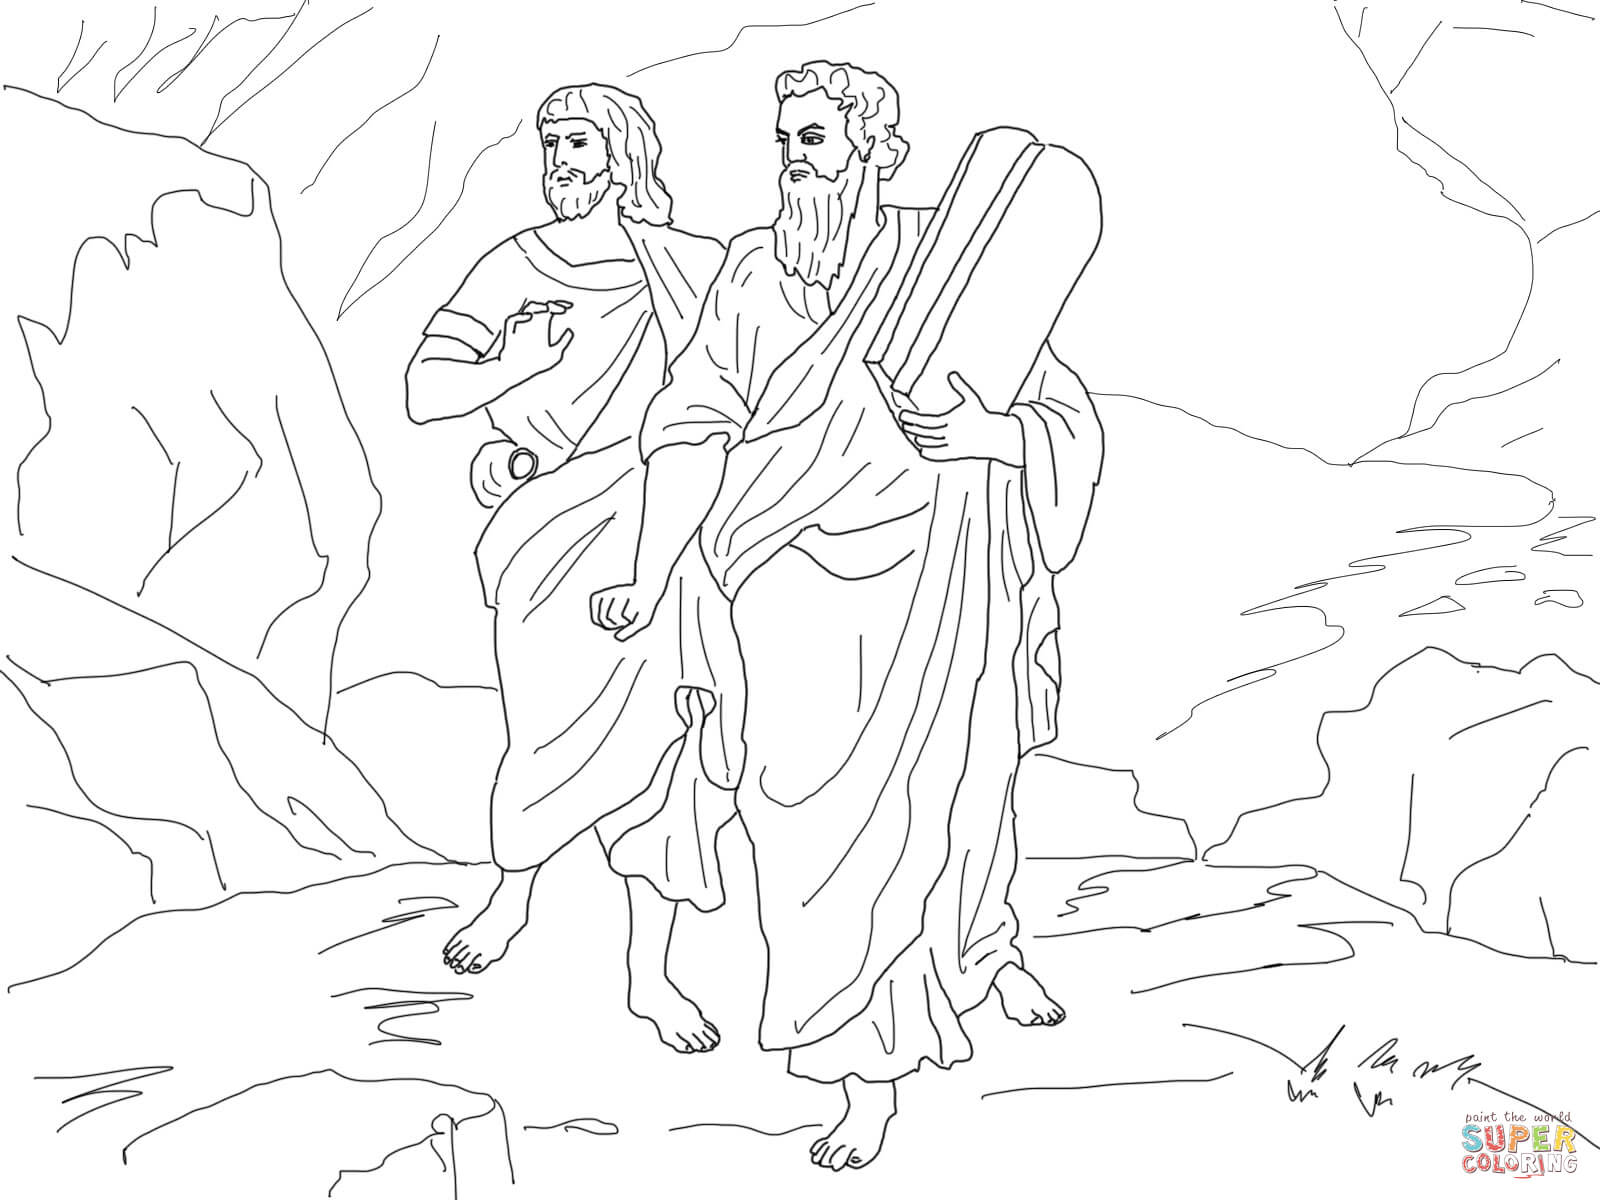 Joshua Tree coloring, Download Joshua Tree coloring for